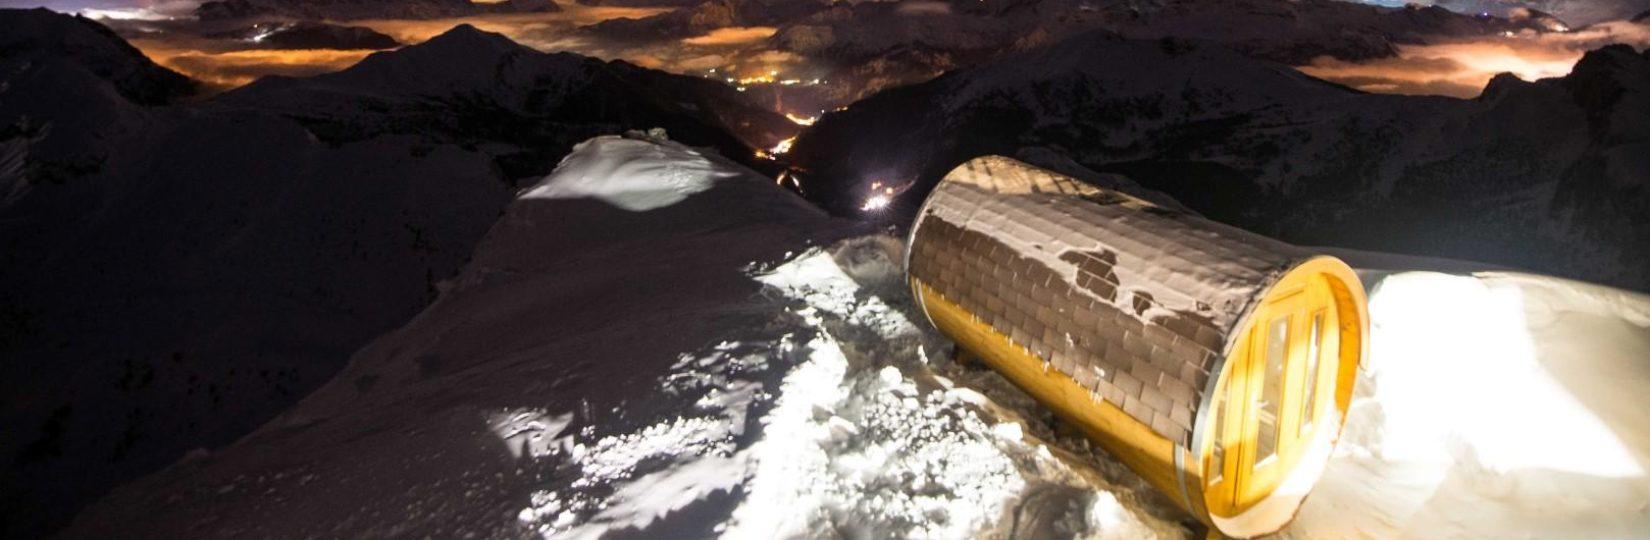 Snow Service Cortina.Winter Experience Hotel Pontechiesa